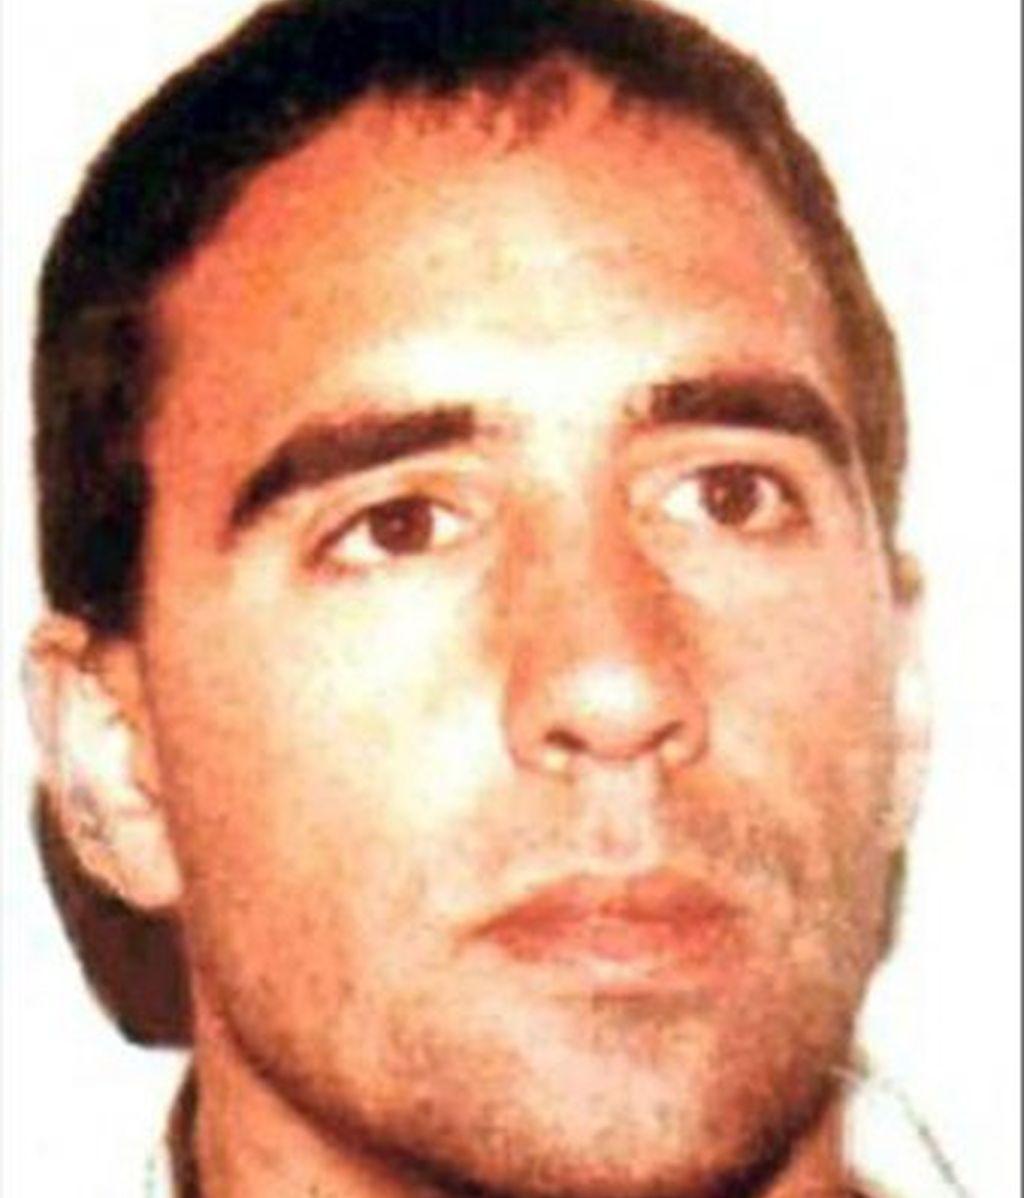 Raúl Fuentes Villota, detenido en Liverpool